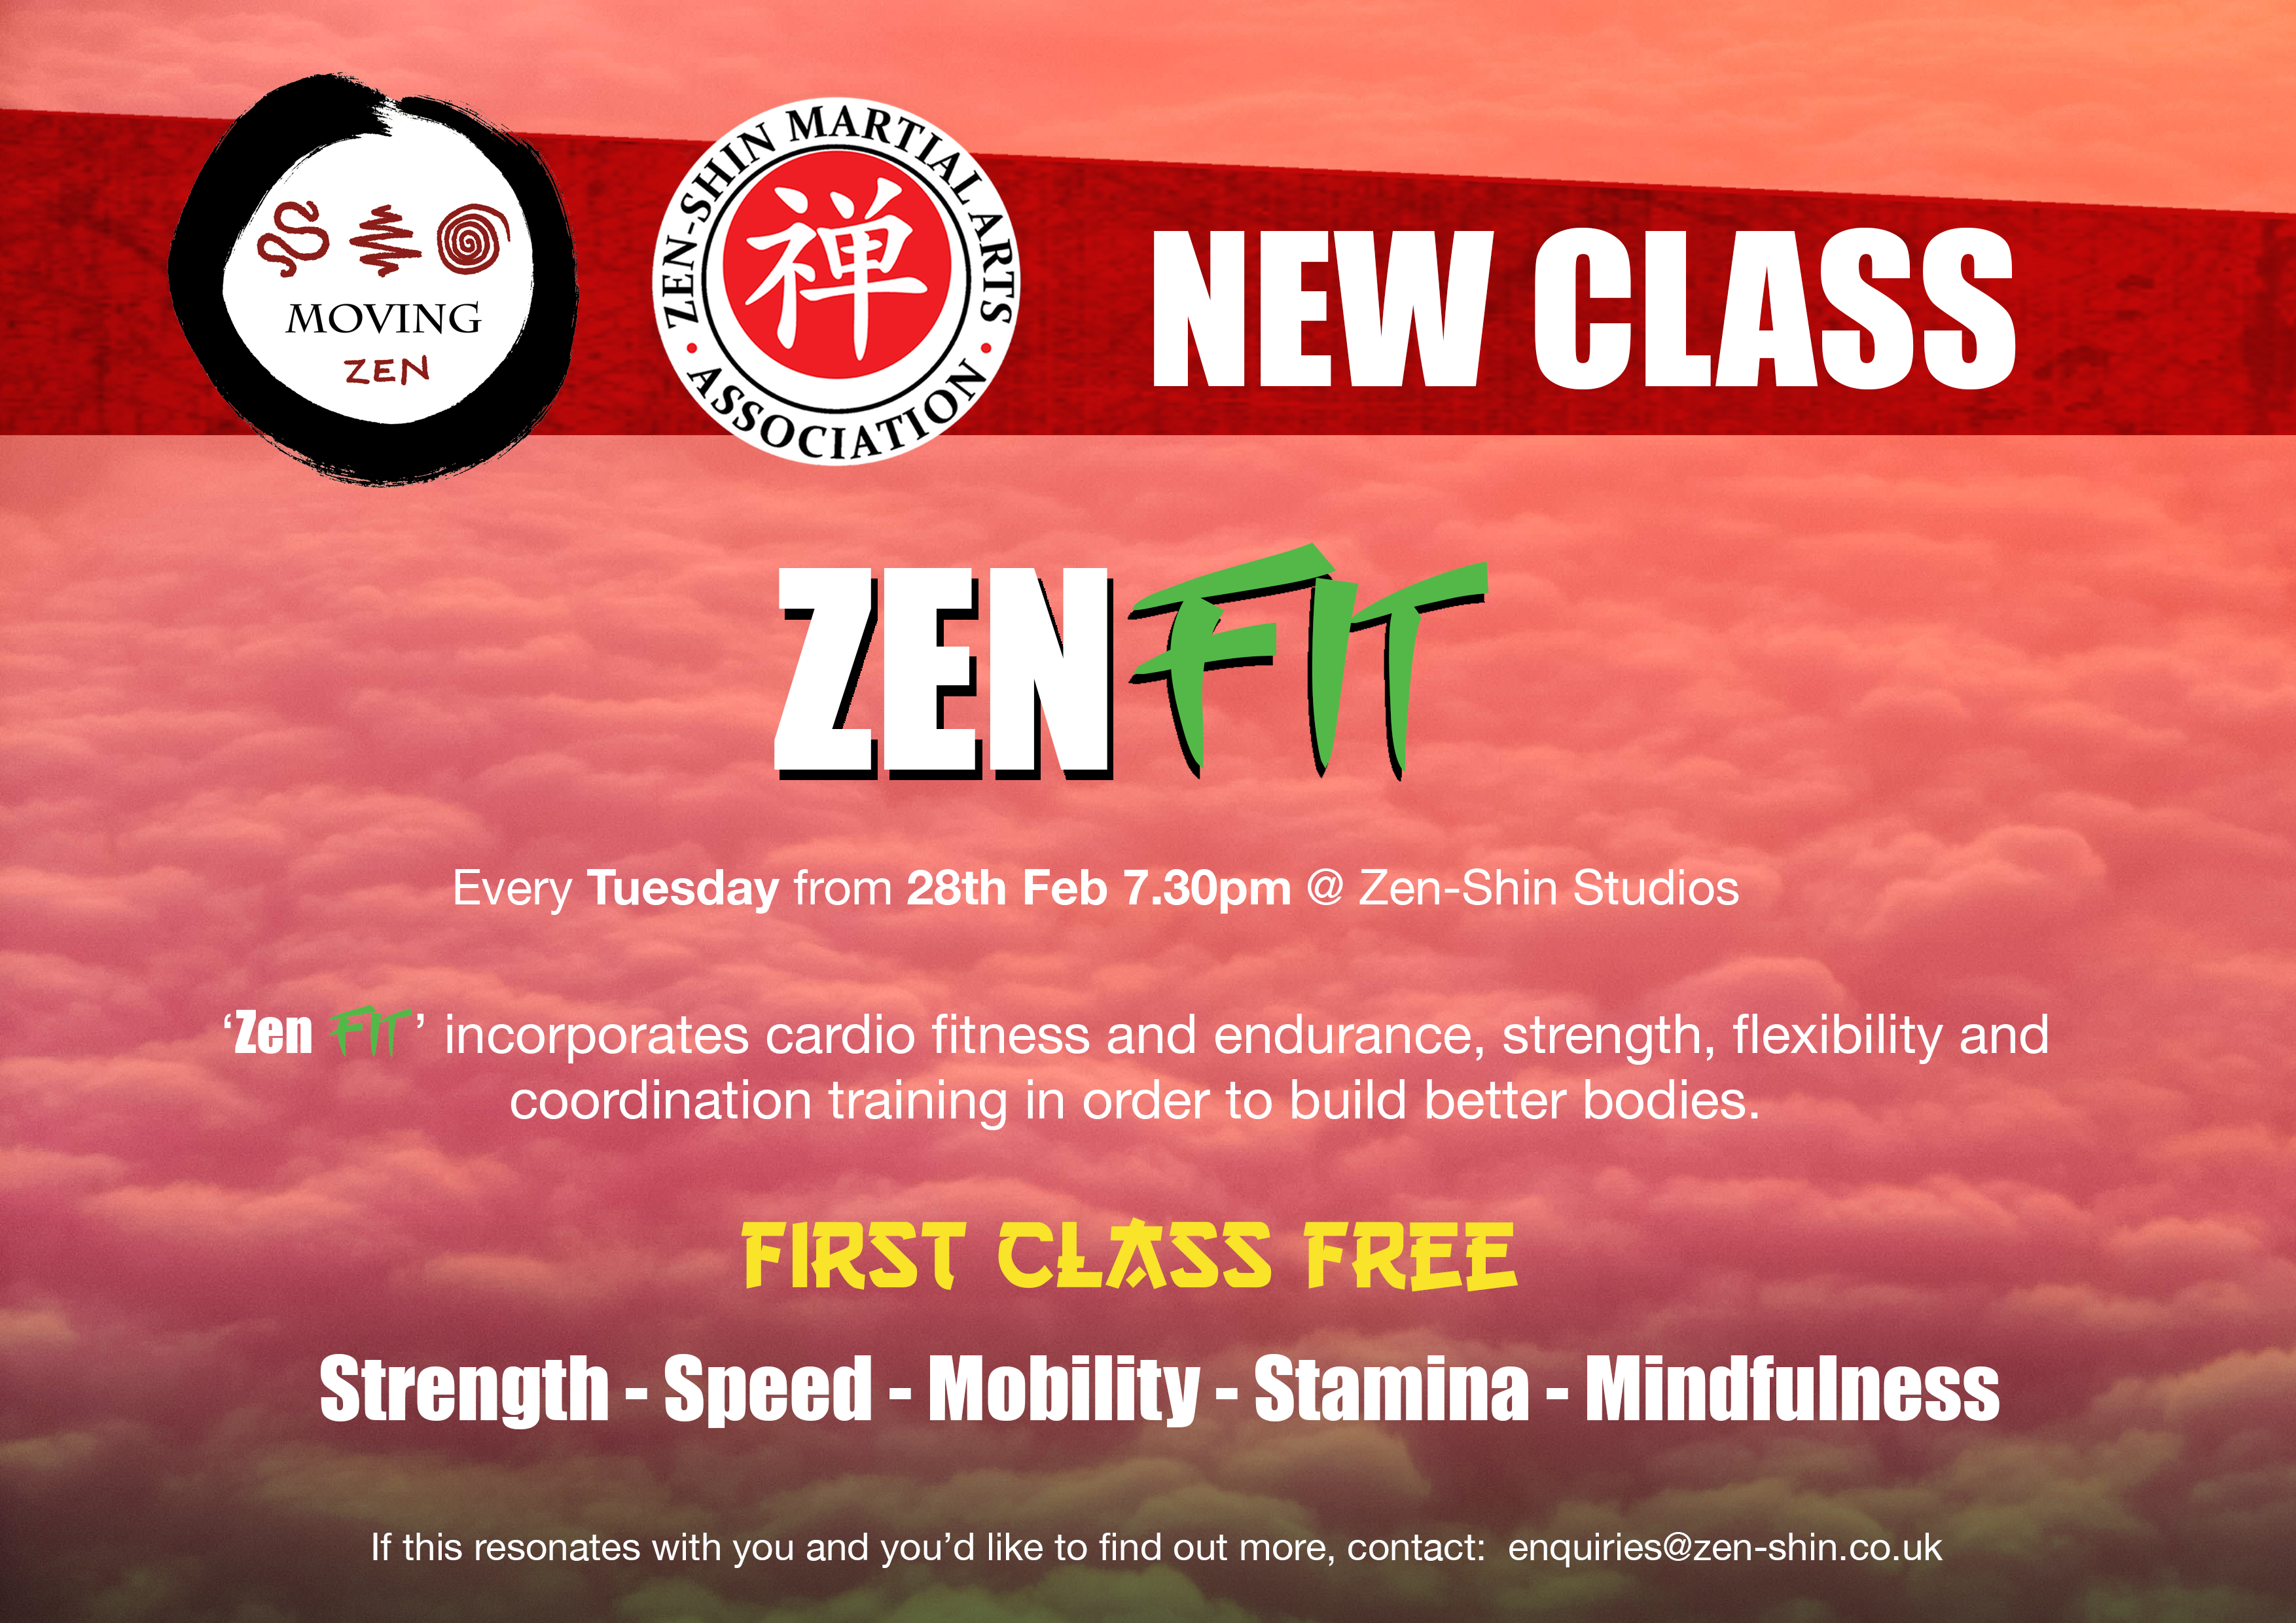 zenfit poster